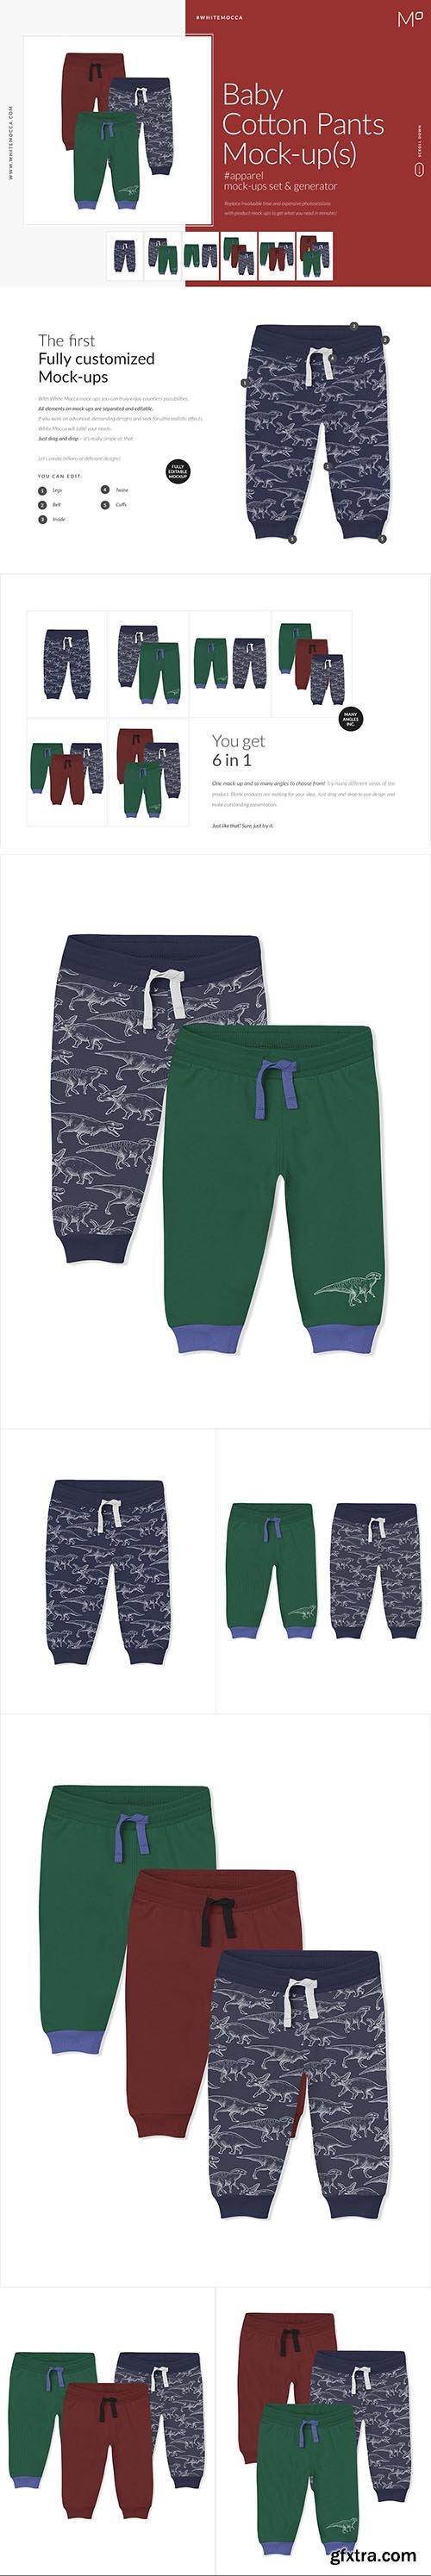 CreativeMarket - Baby Cotton Pants Mock-ups Set 4662197